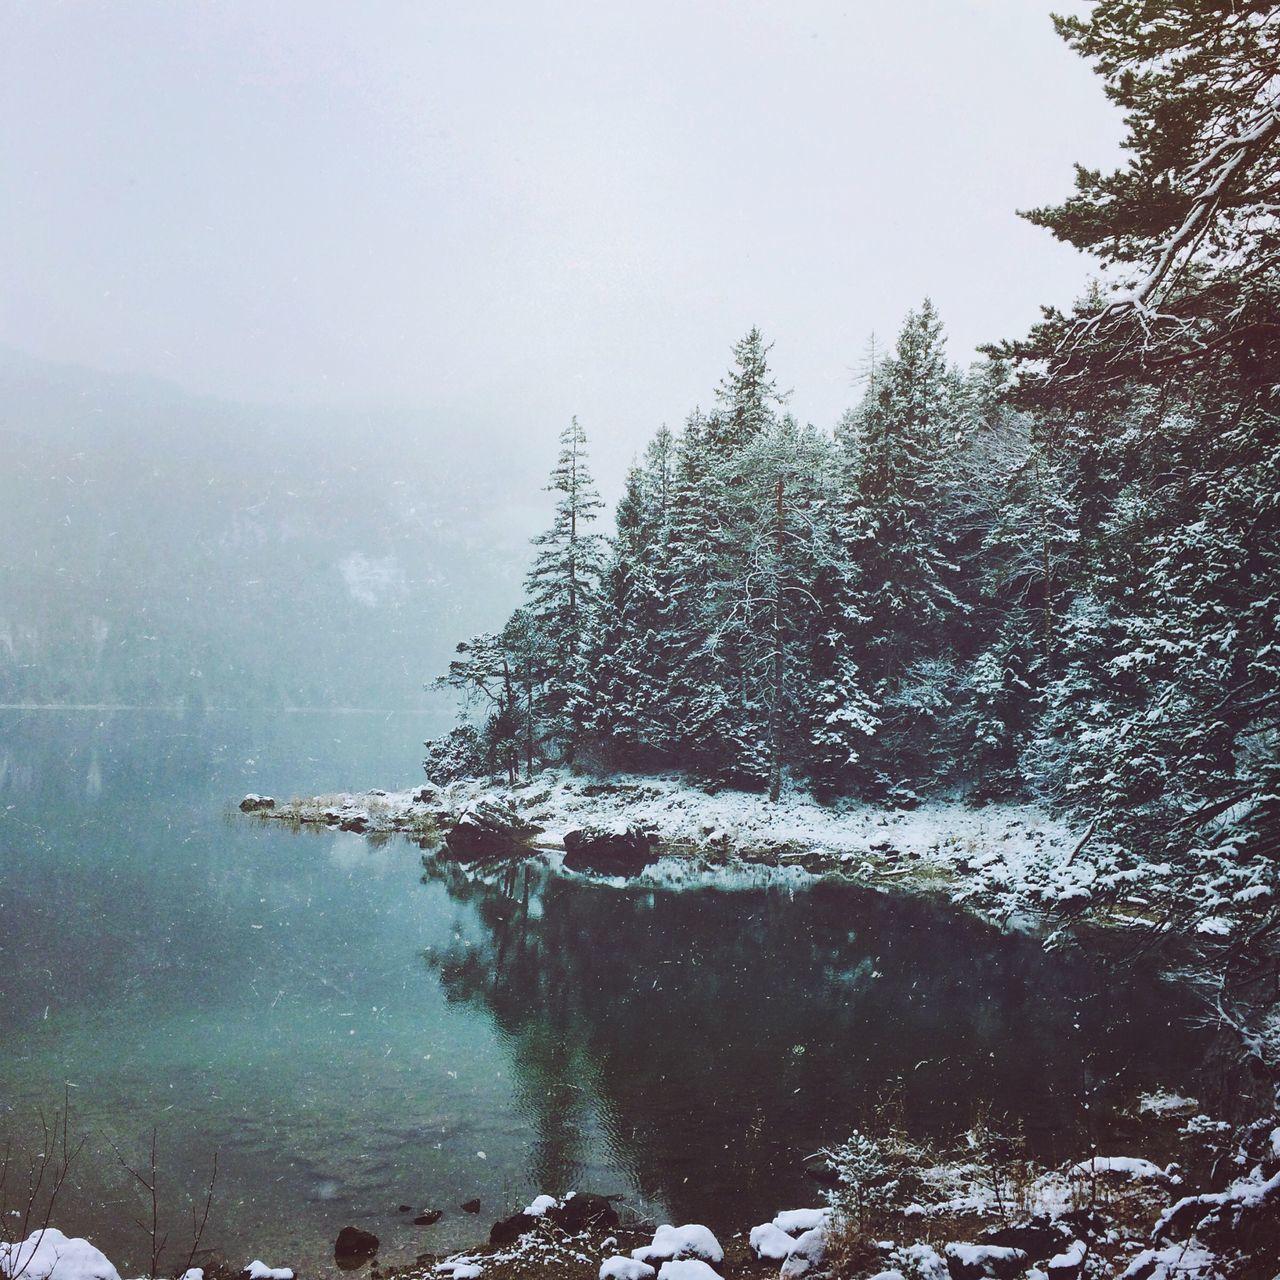 Magical winter days. Showcase: December IPhoneography Alpen Eibsee Lake EyeEm Nature Lover Winter Snow Fog Mountains EyeEm Best Shots EyeEm Best Shots - Nature